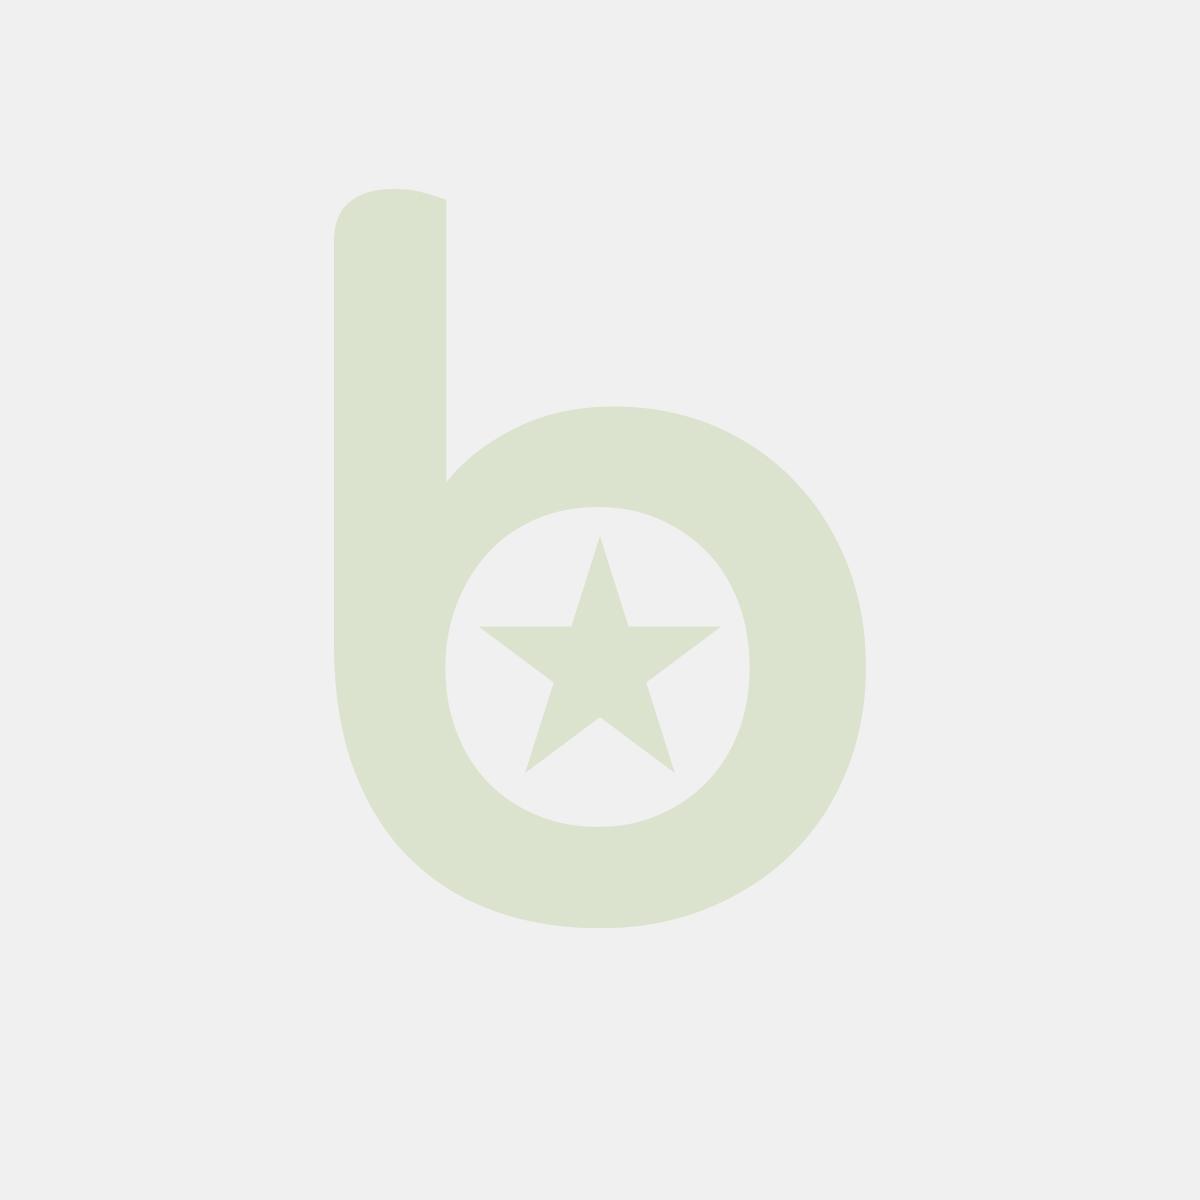 Taca prostokątna 32x26x1,5cm GN1/2 czarna z melaminy